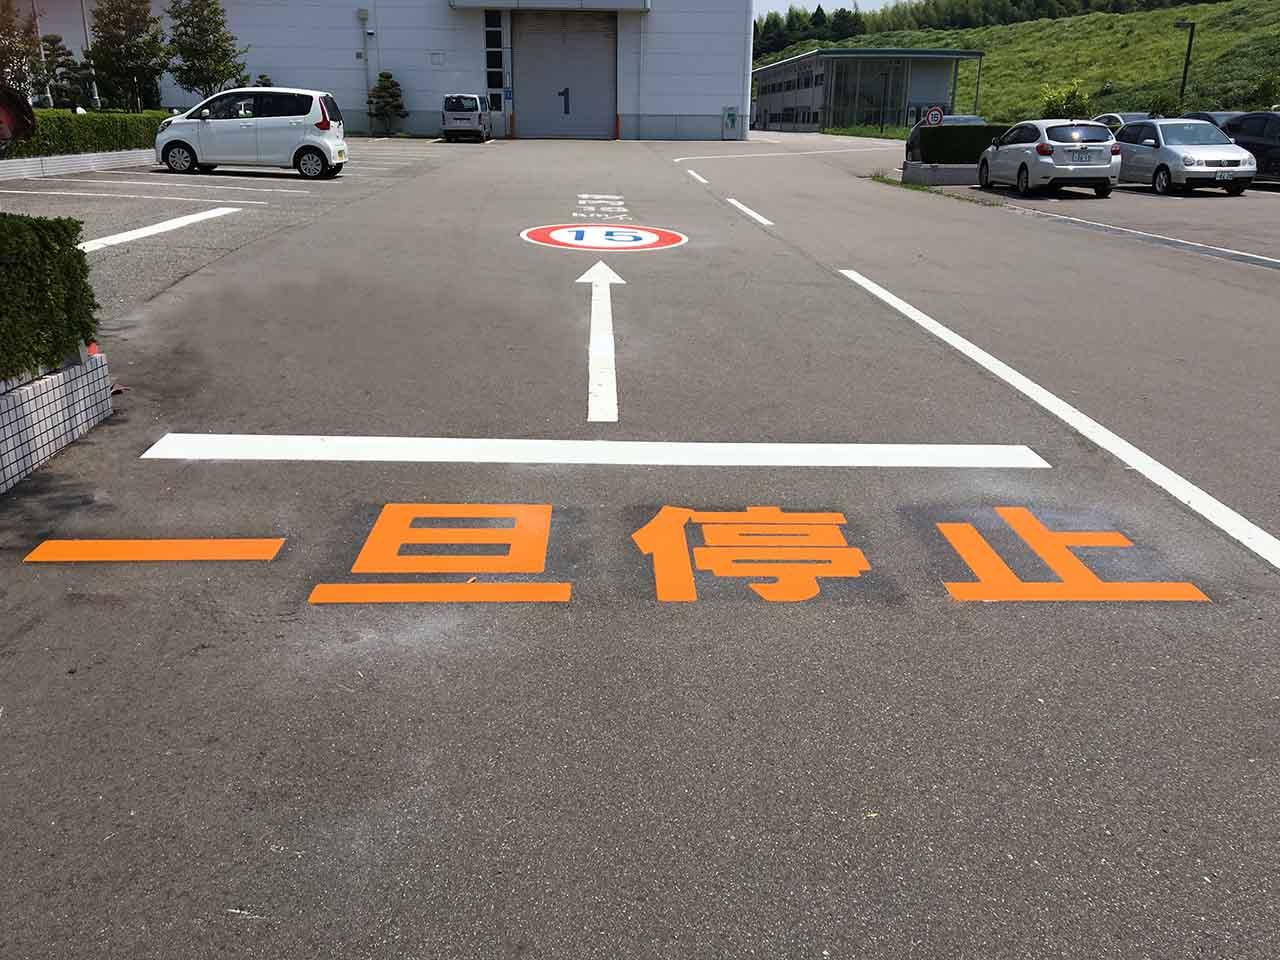 一旦停止・最高速度(323) 標識マーク   サンコー企画株式会社